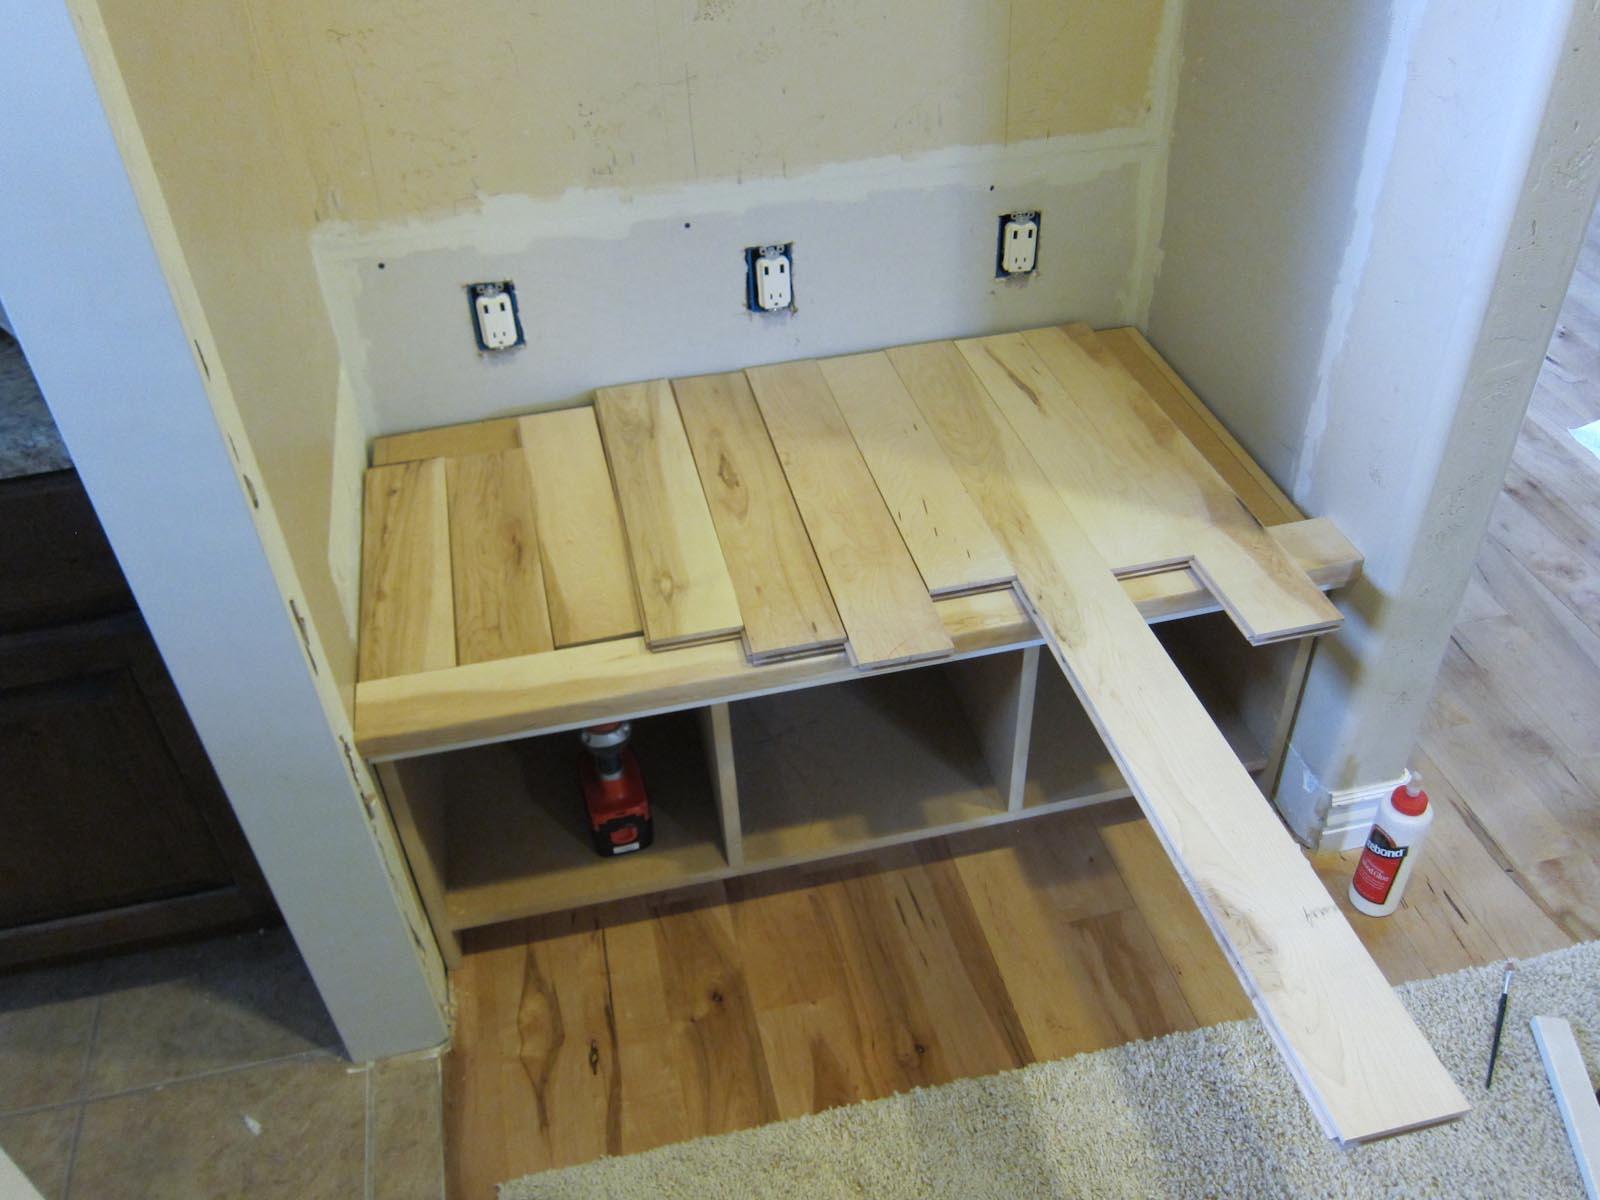 Mudroom Locker Plans Diy Pdf Woodworking